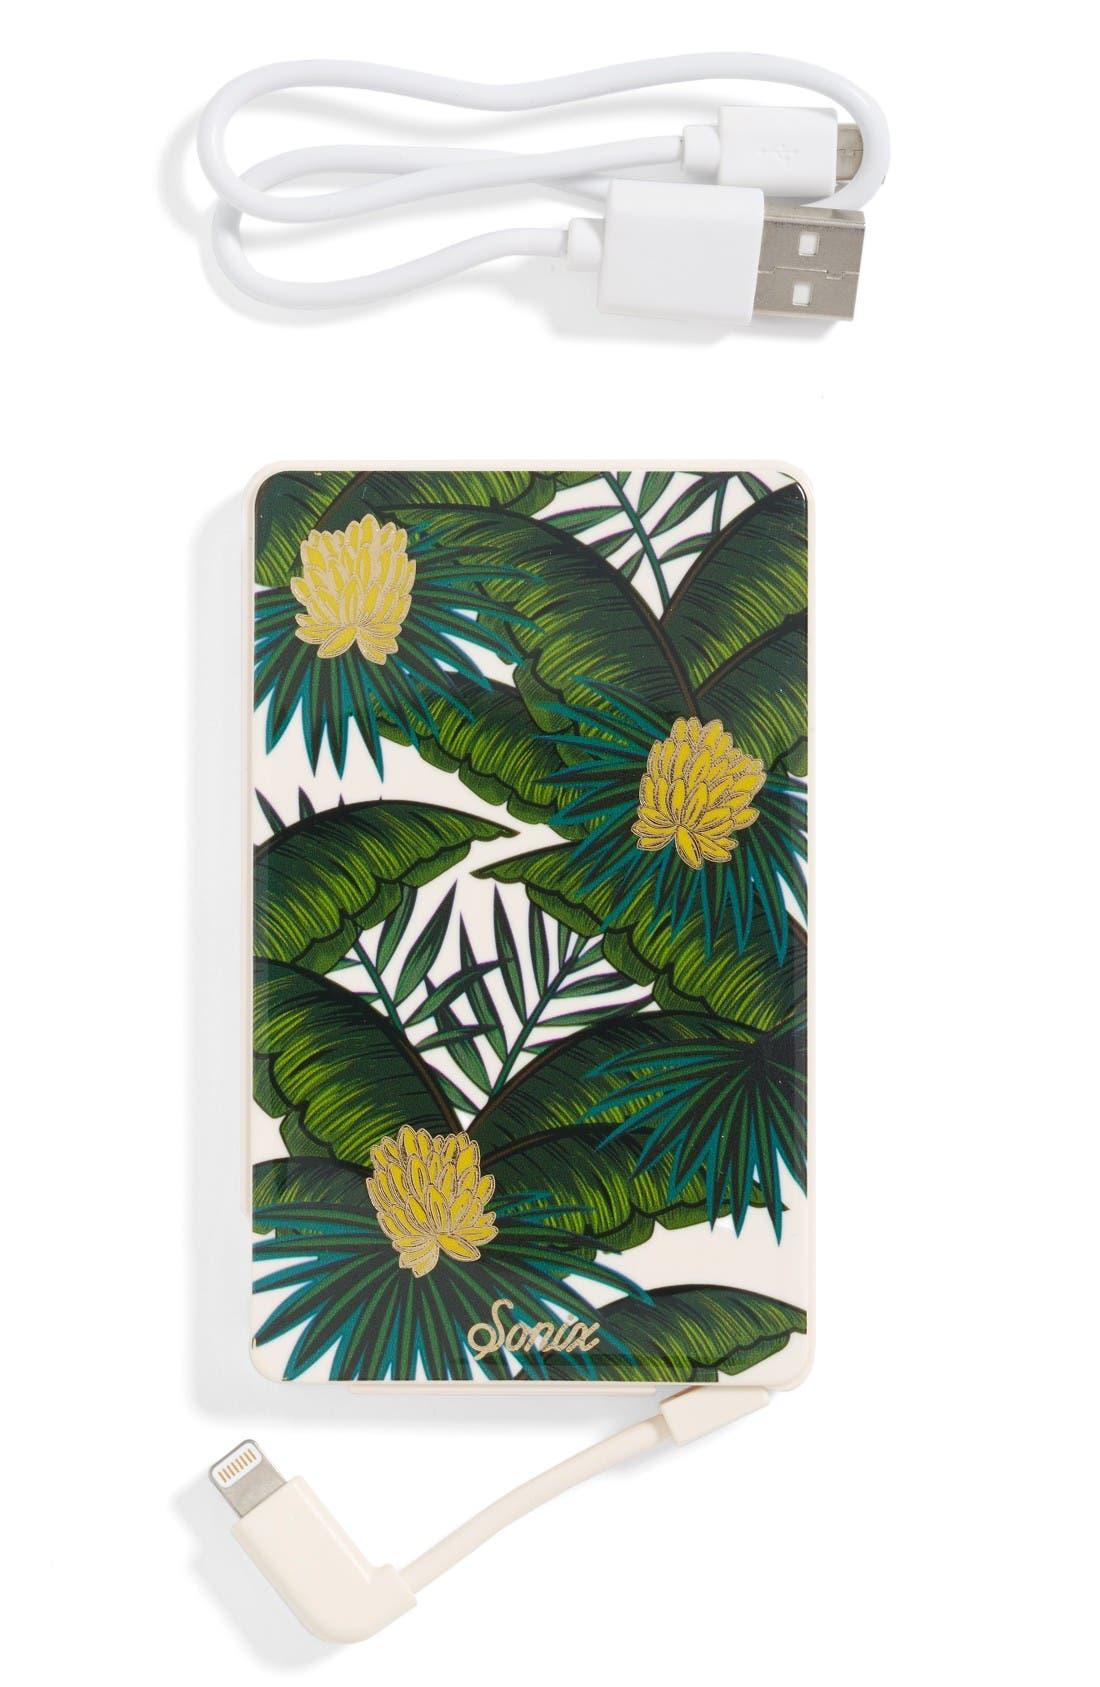 Main Image - Sonix Coco Banana Portable iPhone Charger